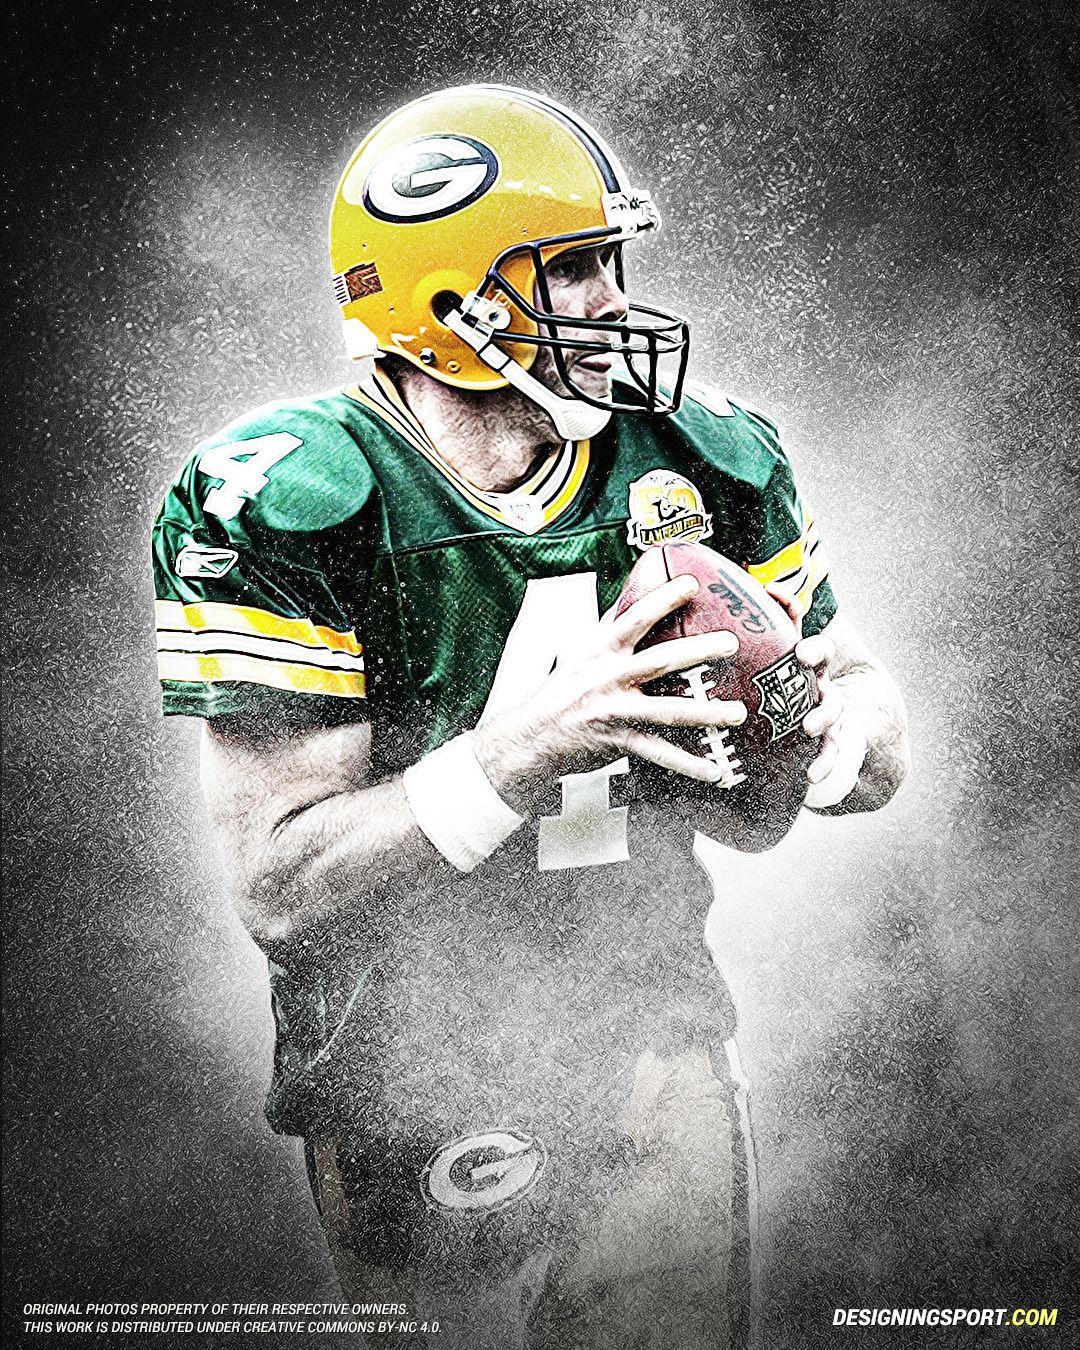 Designing Sport Brett Favre Green Bay Packers Green Bay Packers Green Bay Green Bay Packers Football